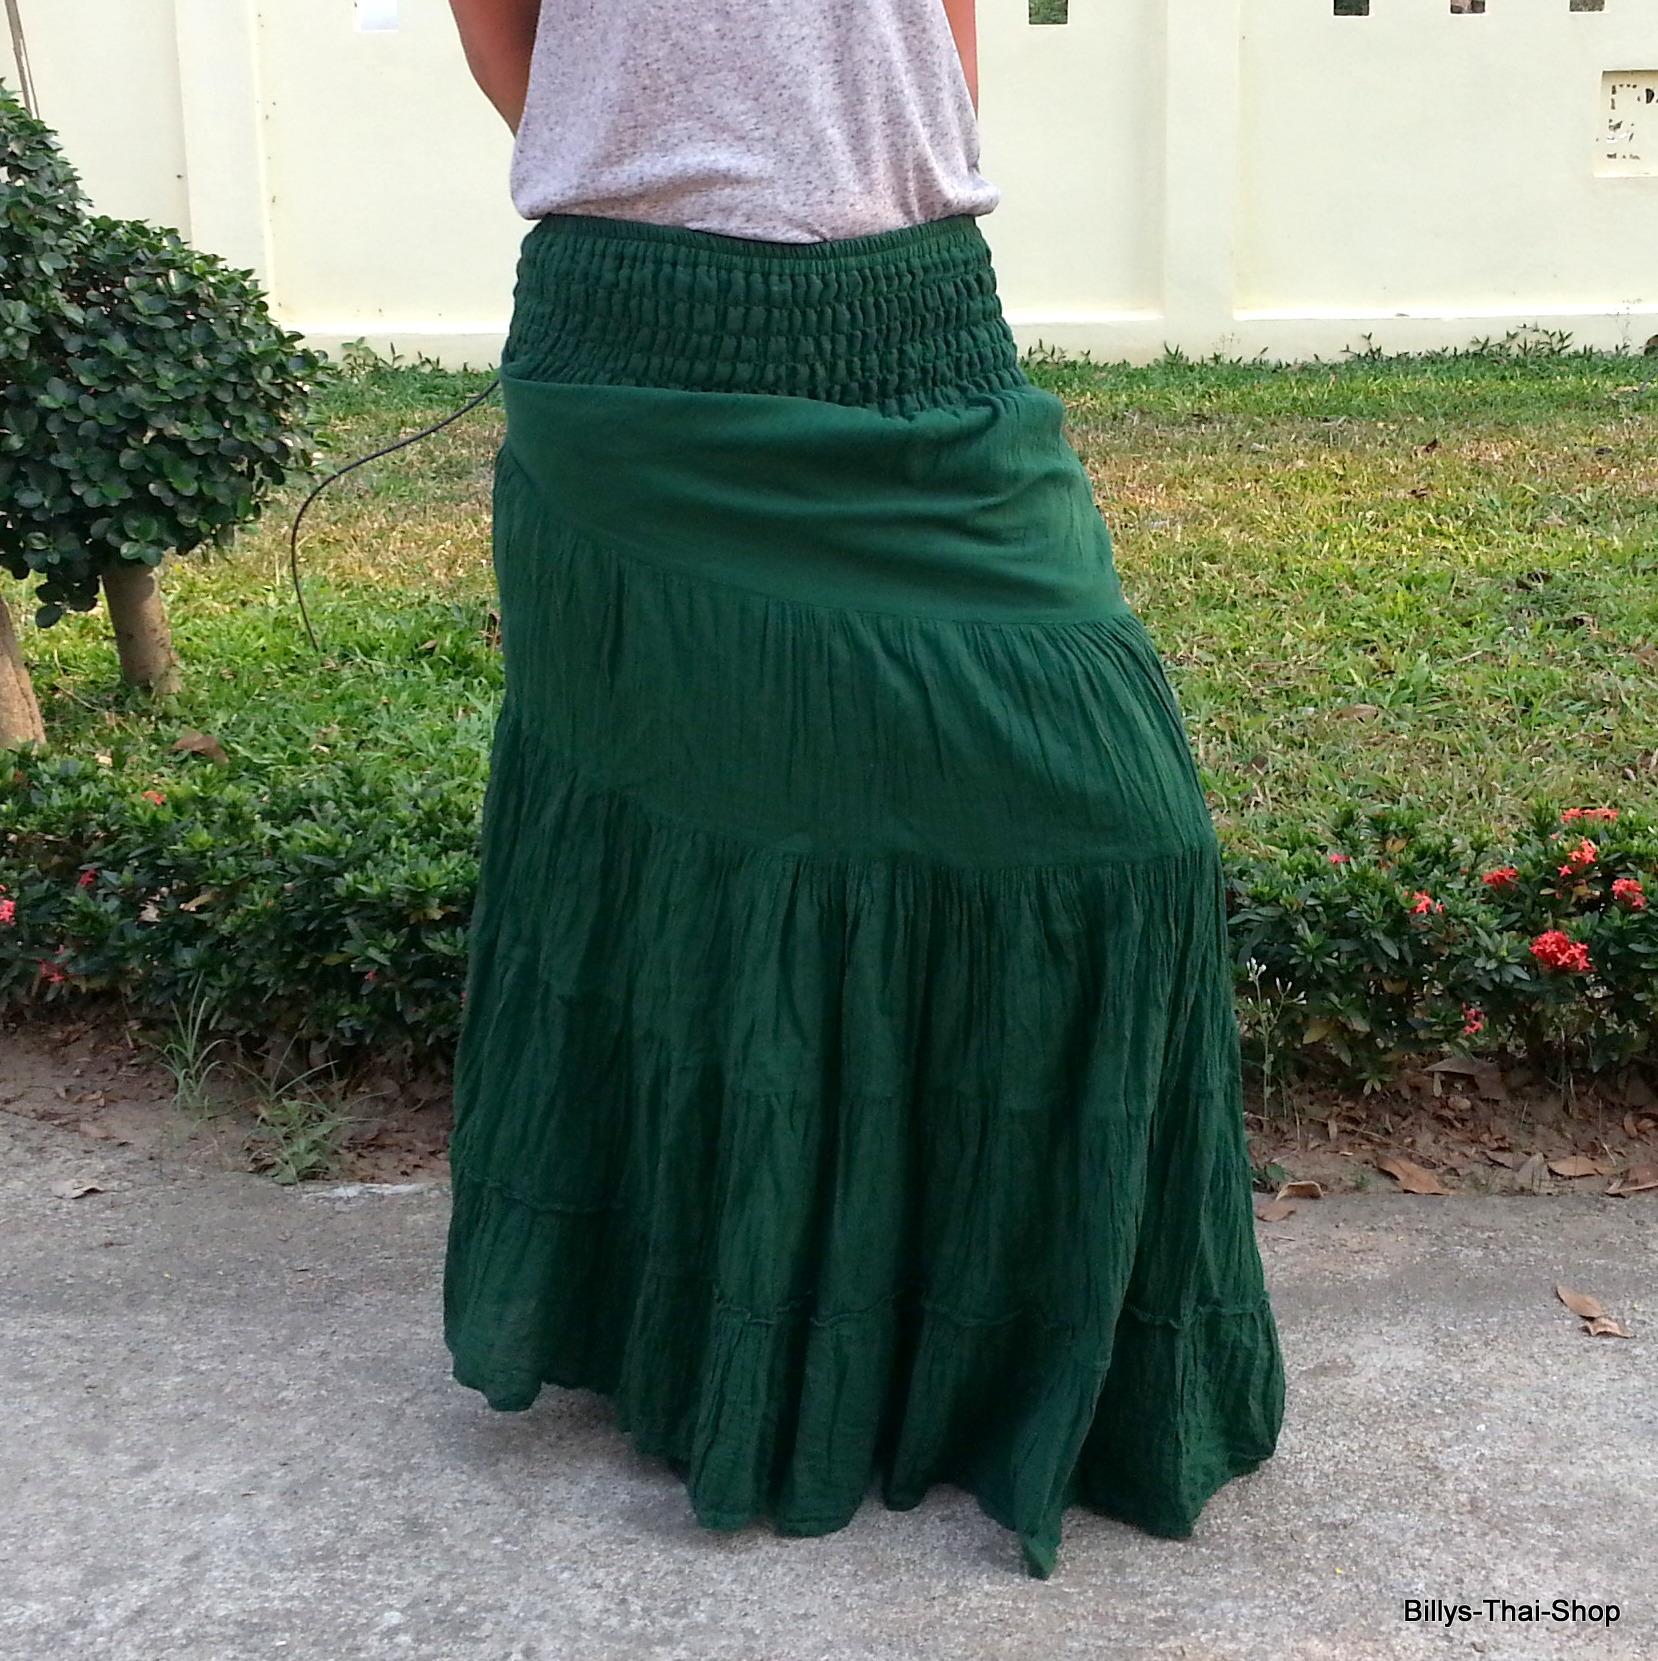 ae0b44bd2c Bohemian Skirt - Billys Thai Shop - Handmade Maxi Skirt